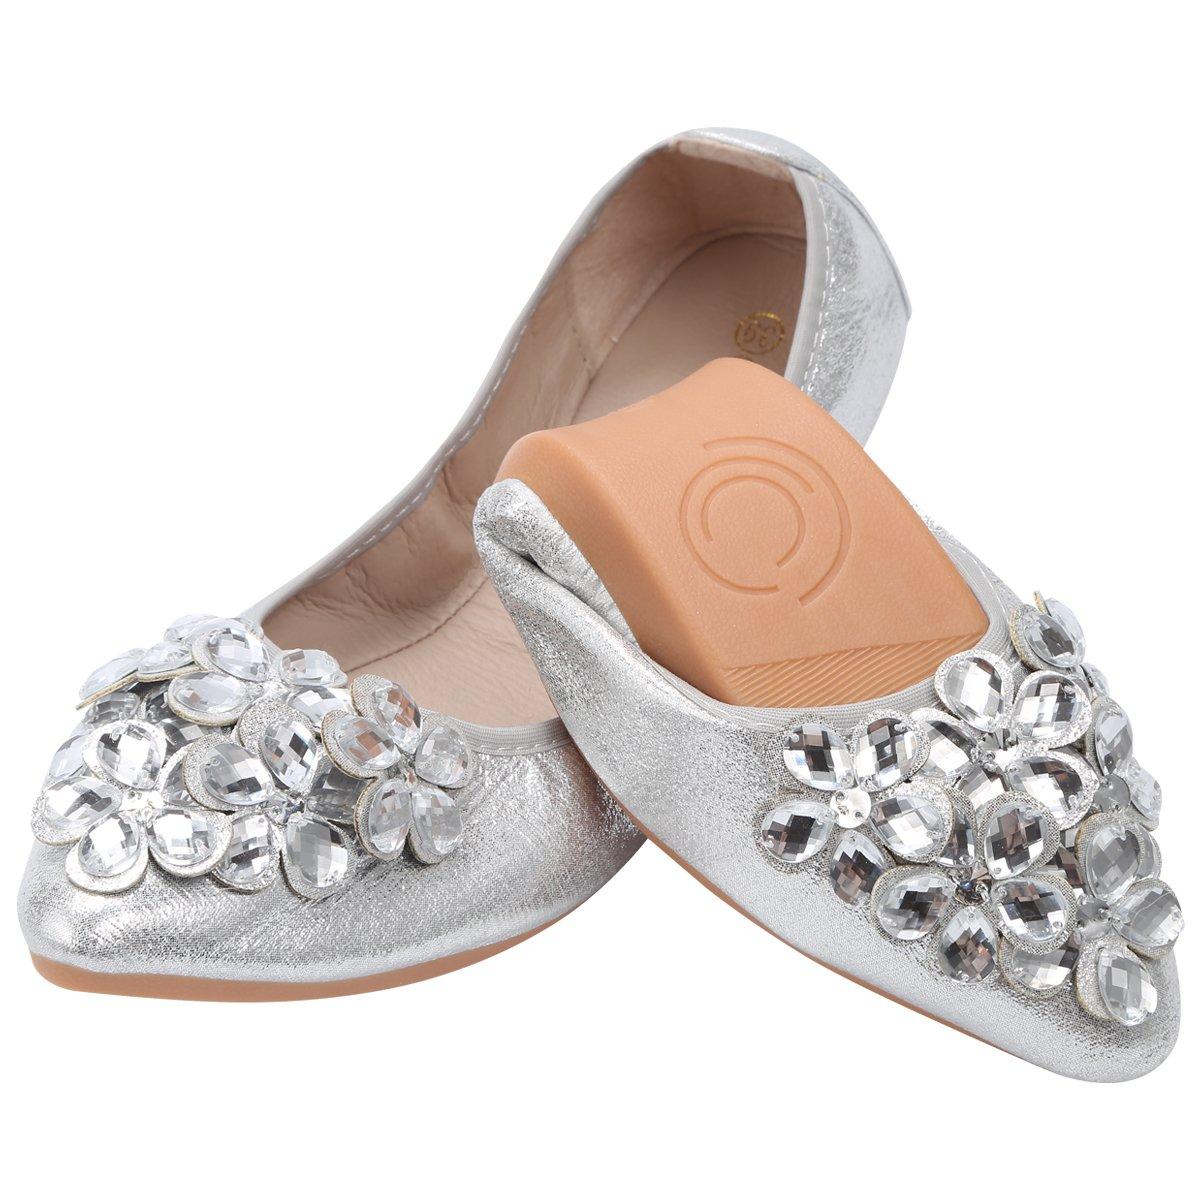 KUNSHOP Women Ballet Flats Rhinestone Wedding Ballerina Shoes Foldable Sparkly Bridal Sandals